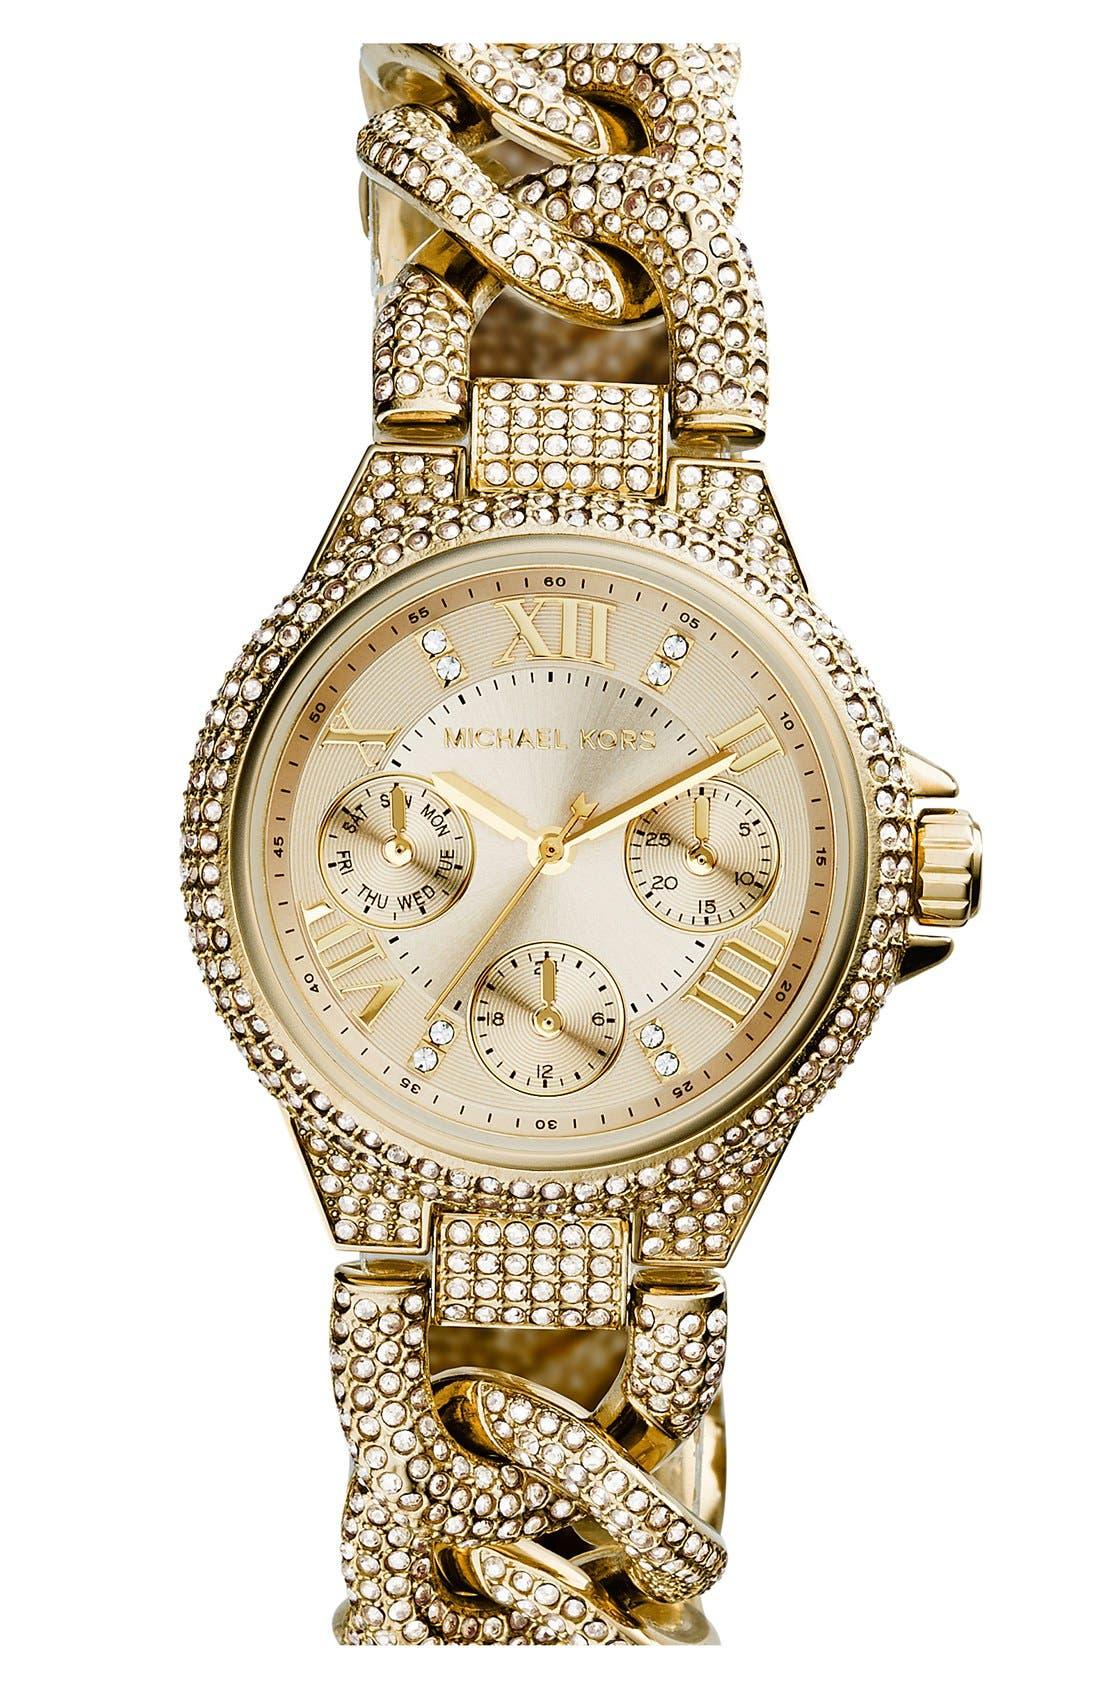 Alternate Image 1 Selected - Michael Kors 'Mini Camille' Crystal Encrusted Chain Link Bracelet Watch, 34mm